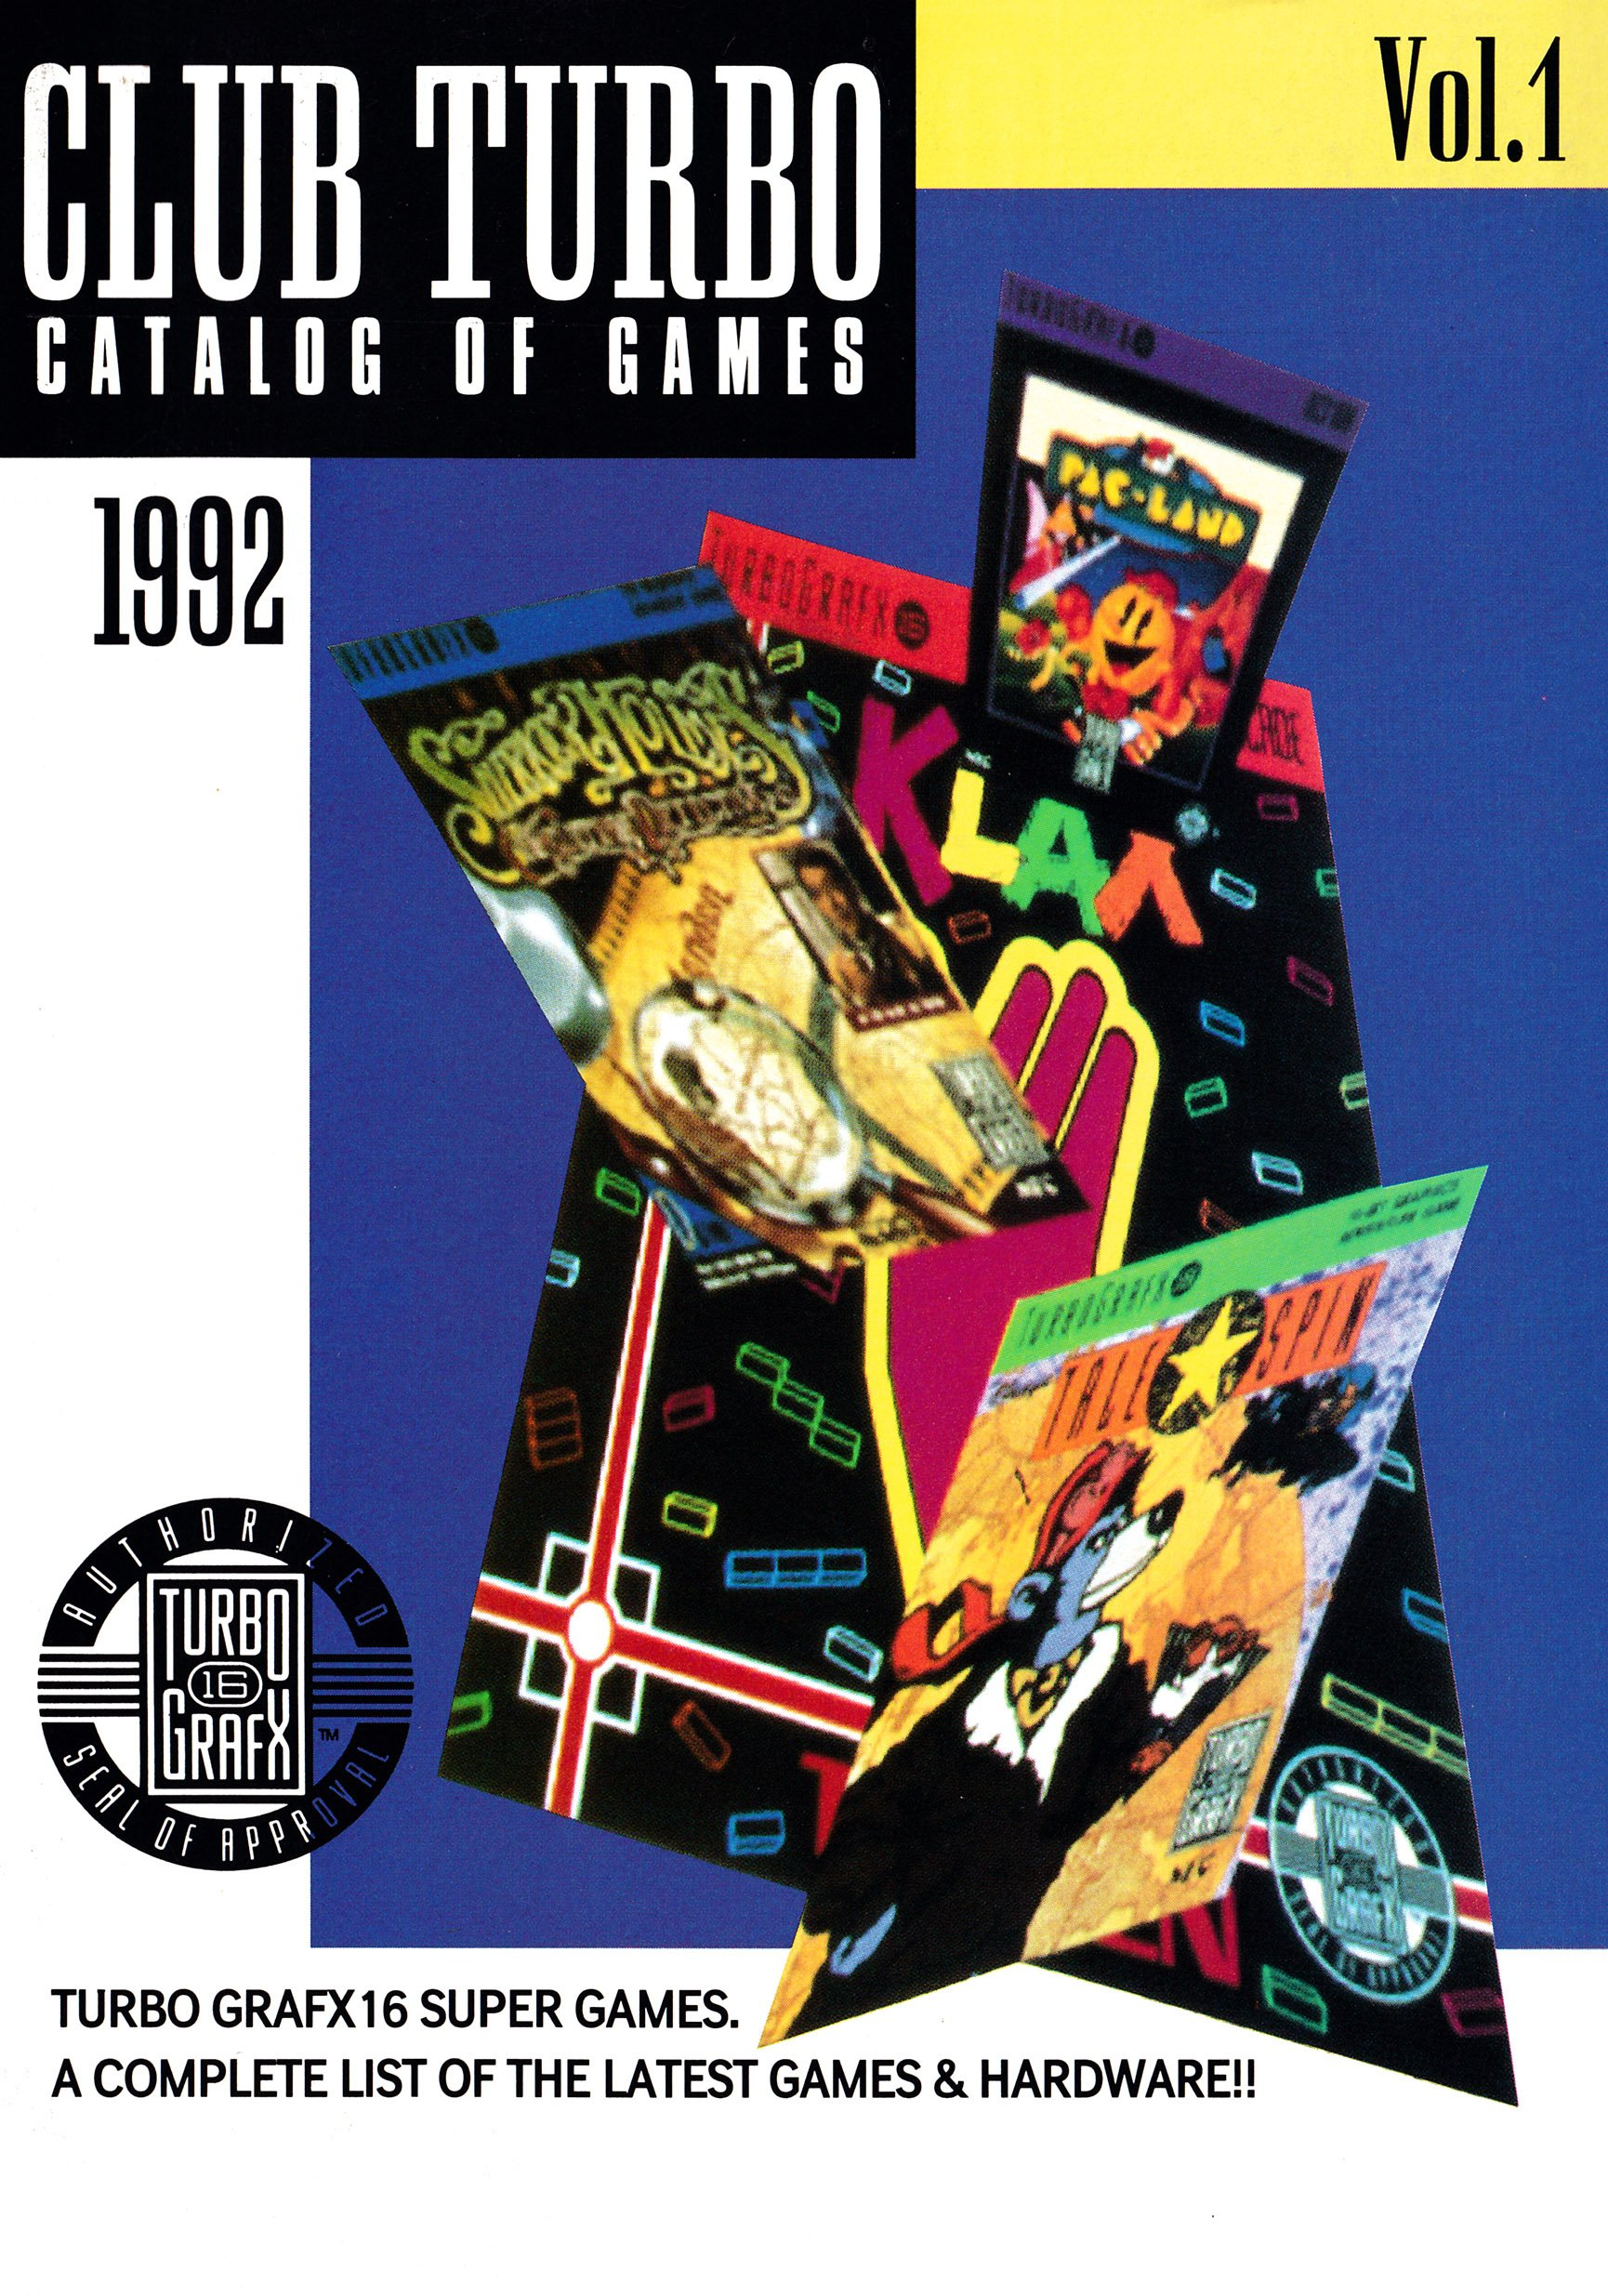 Club Turbo Catalog of Games Volume 1 (1992)